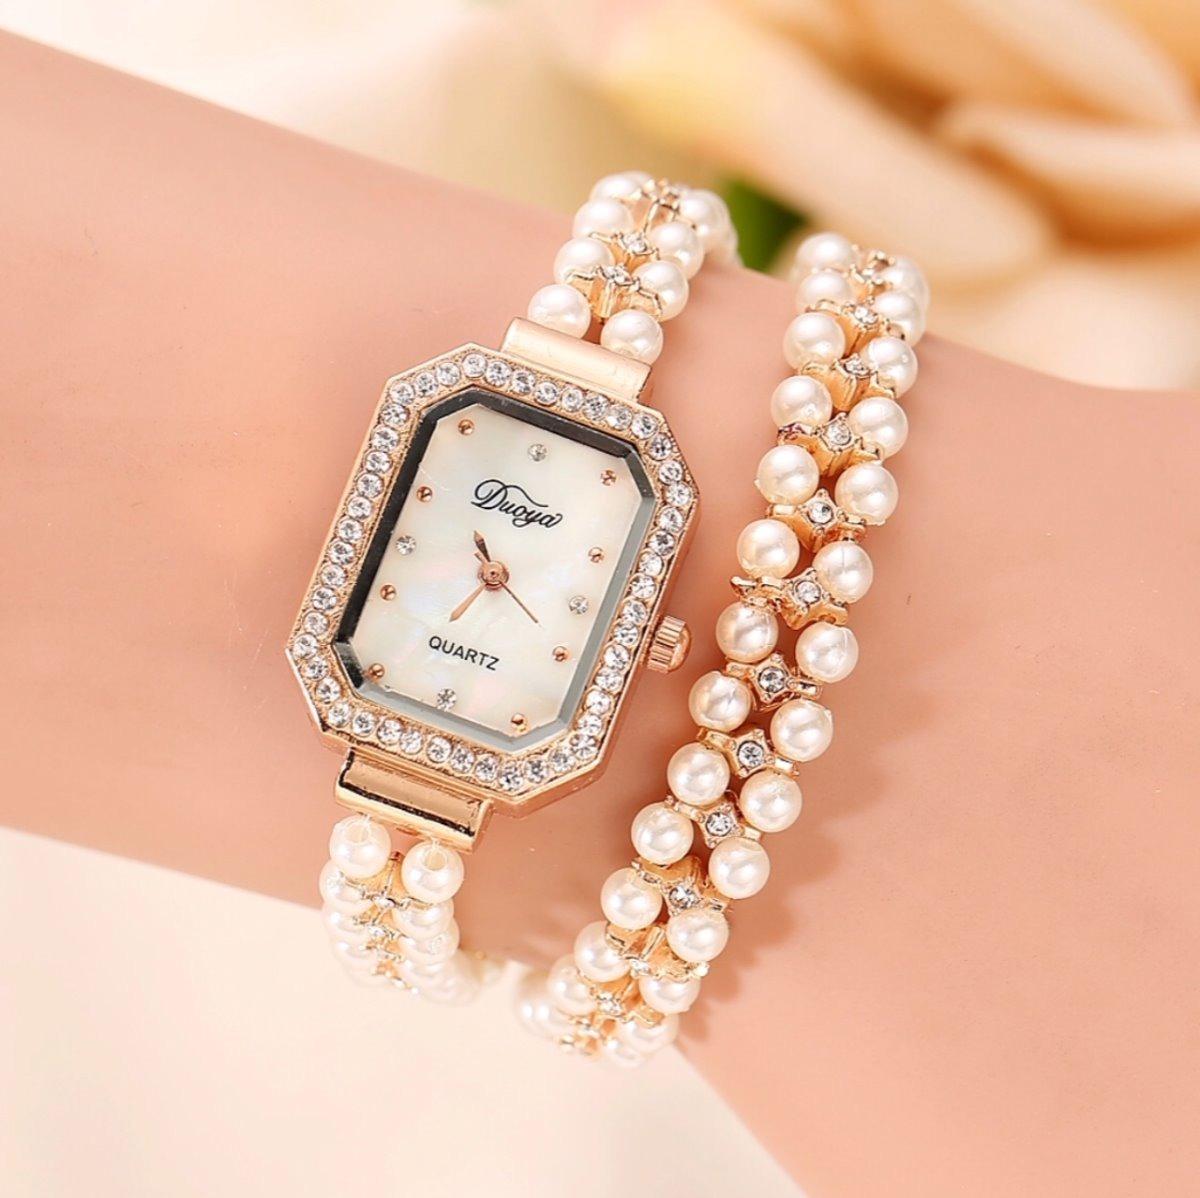 faad27625db relógio feminino duoya bracelete pérolas. Carregando zoom.